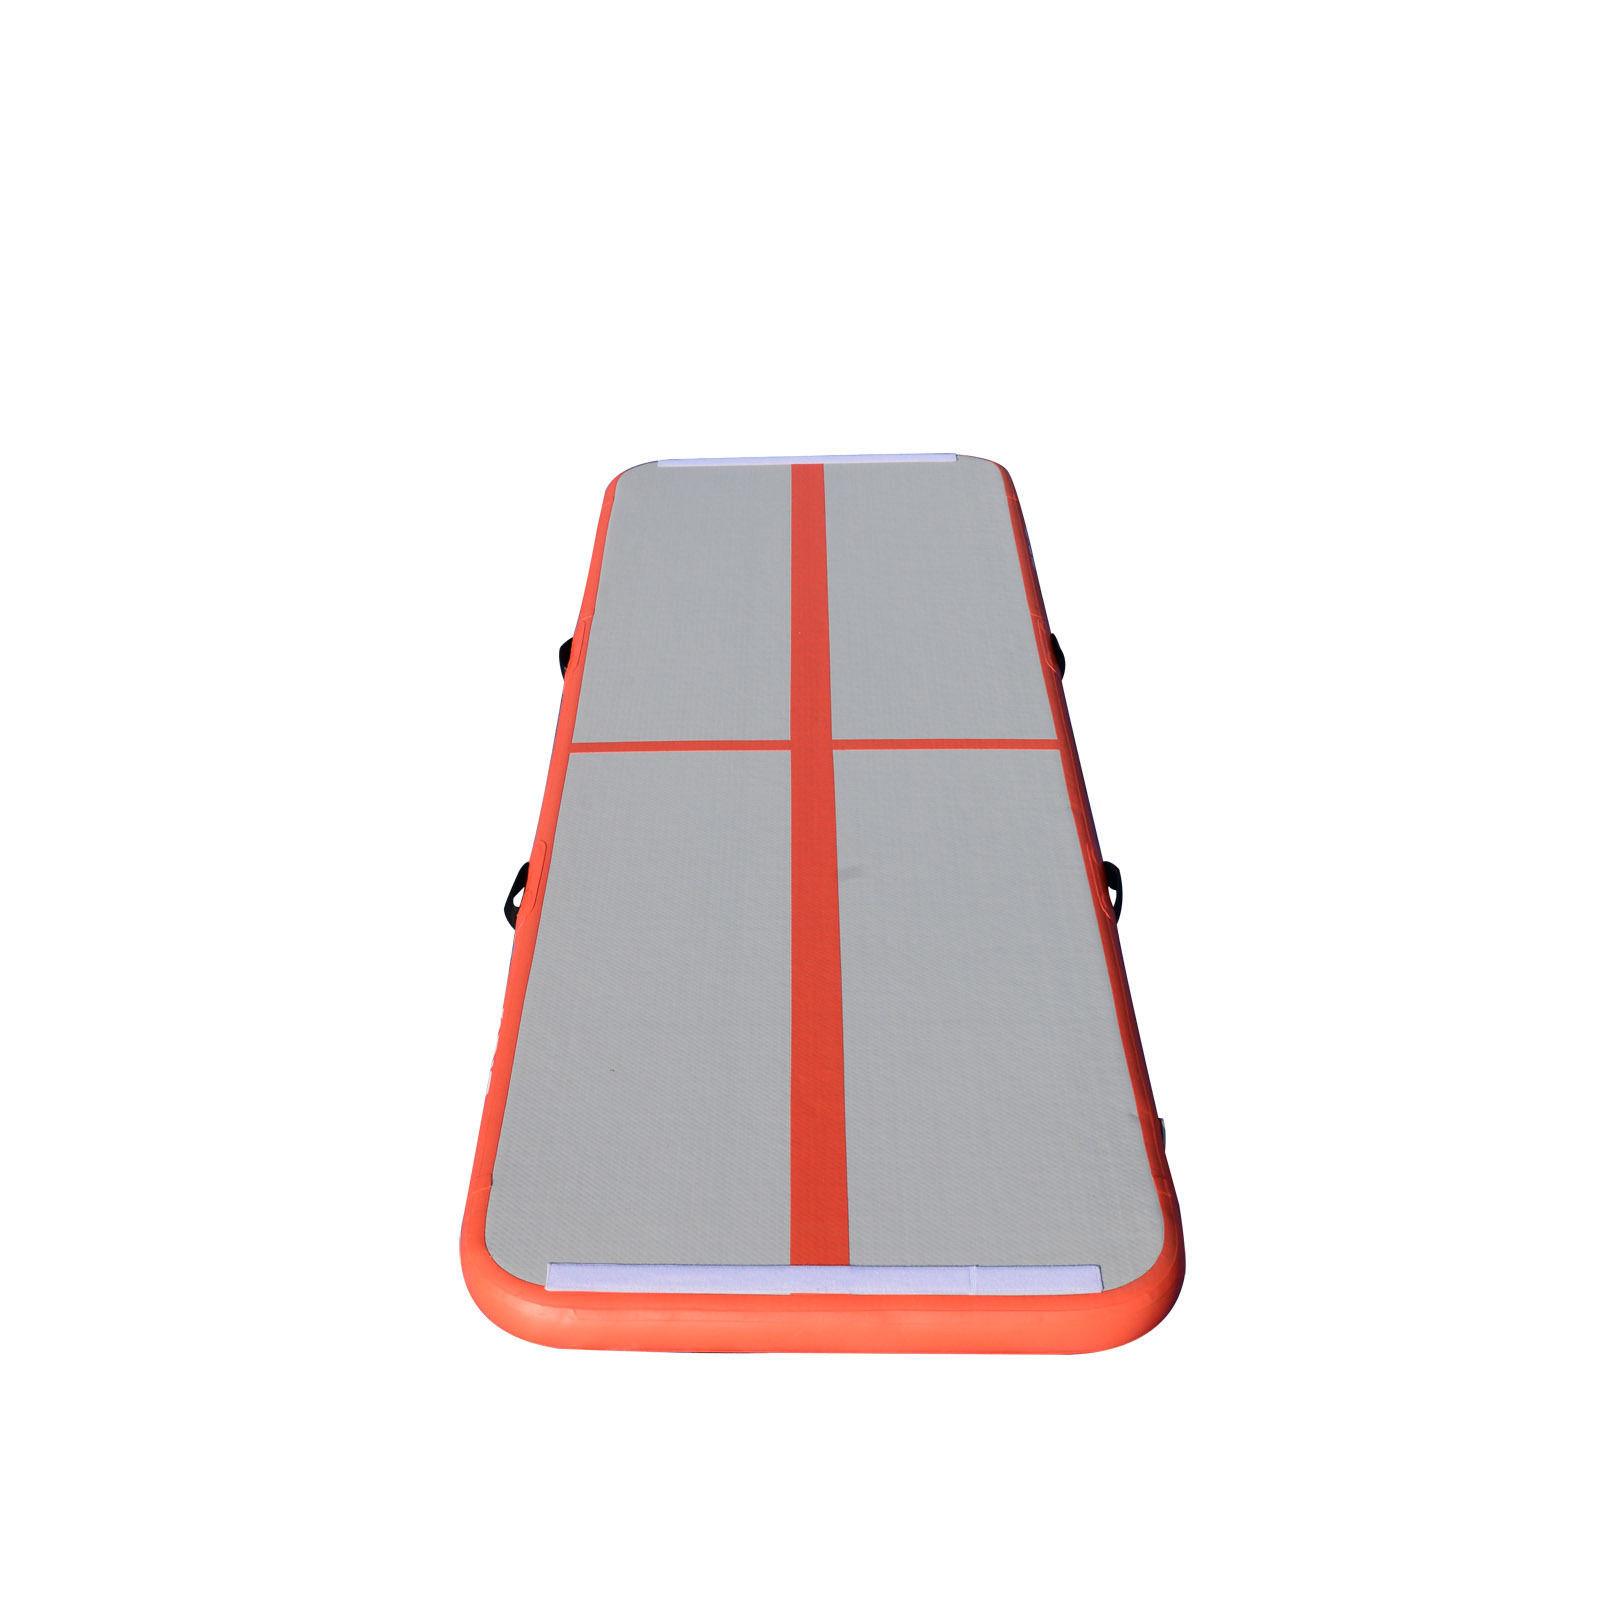 Air Track Floor Home Gymnastics Tumbling Mat Inflatable